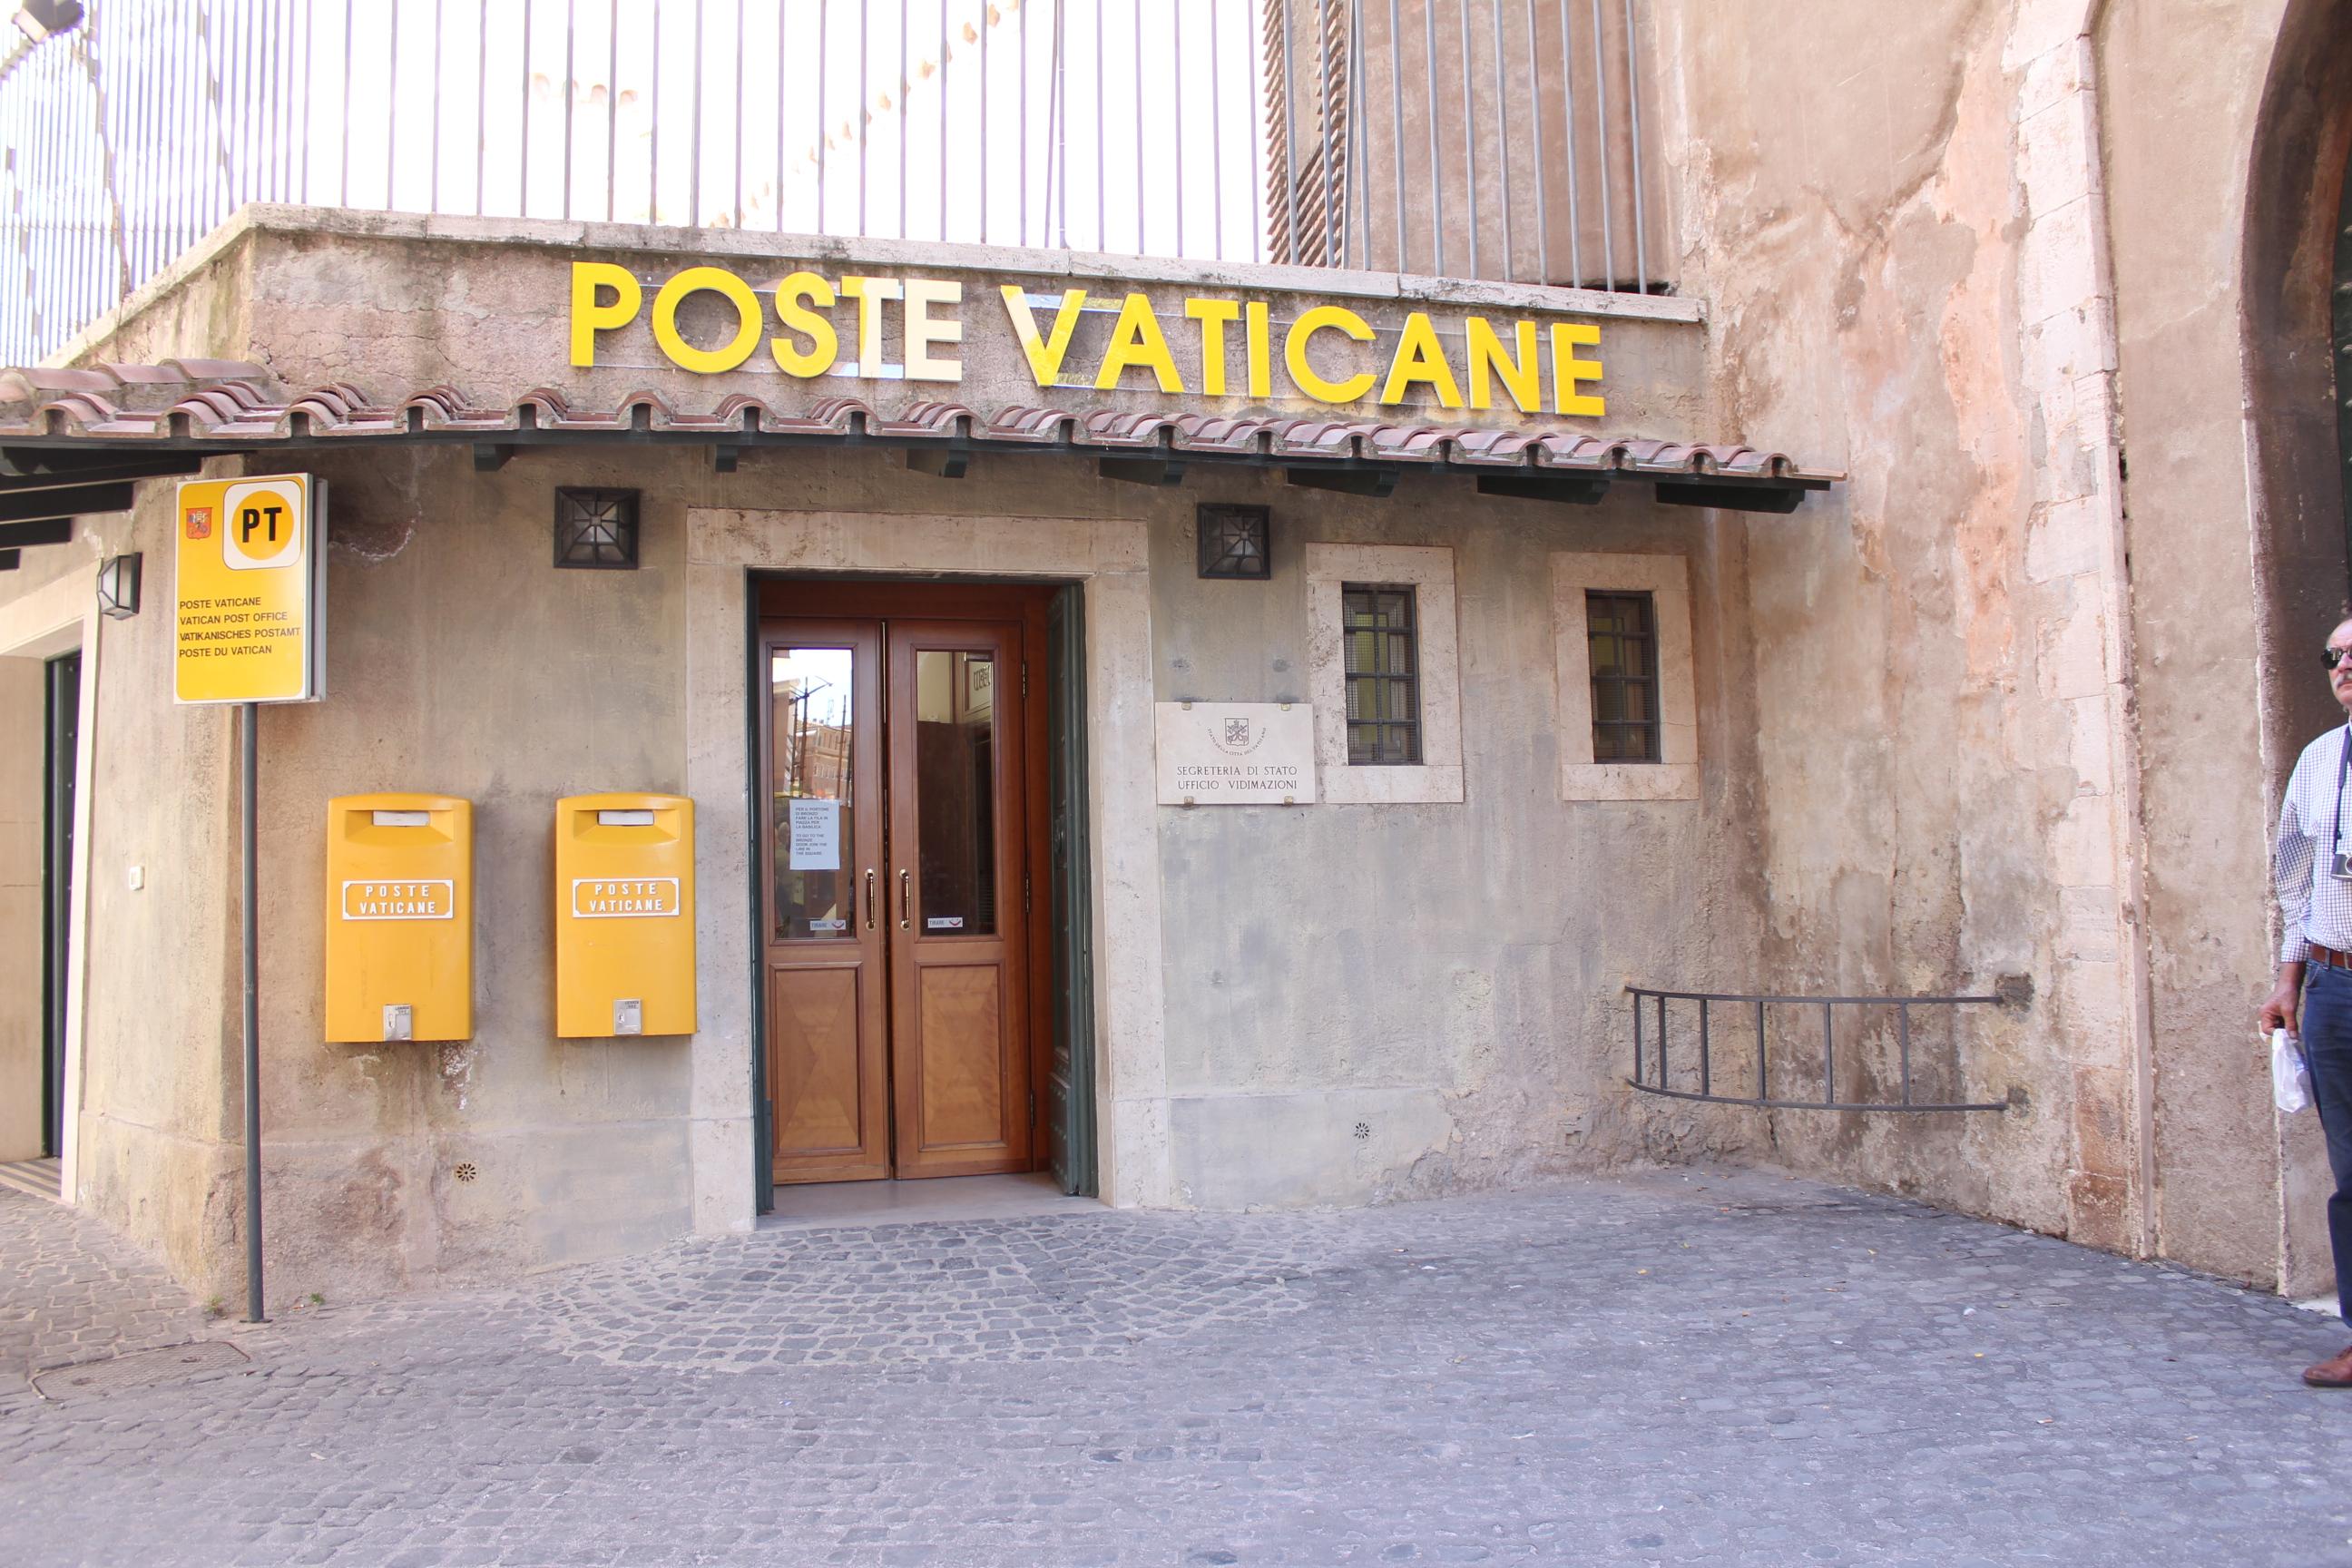 Poste Vaticane. Photo taken on October 17, 2013.